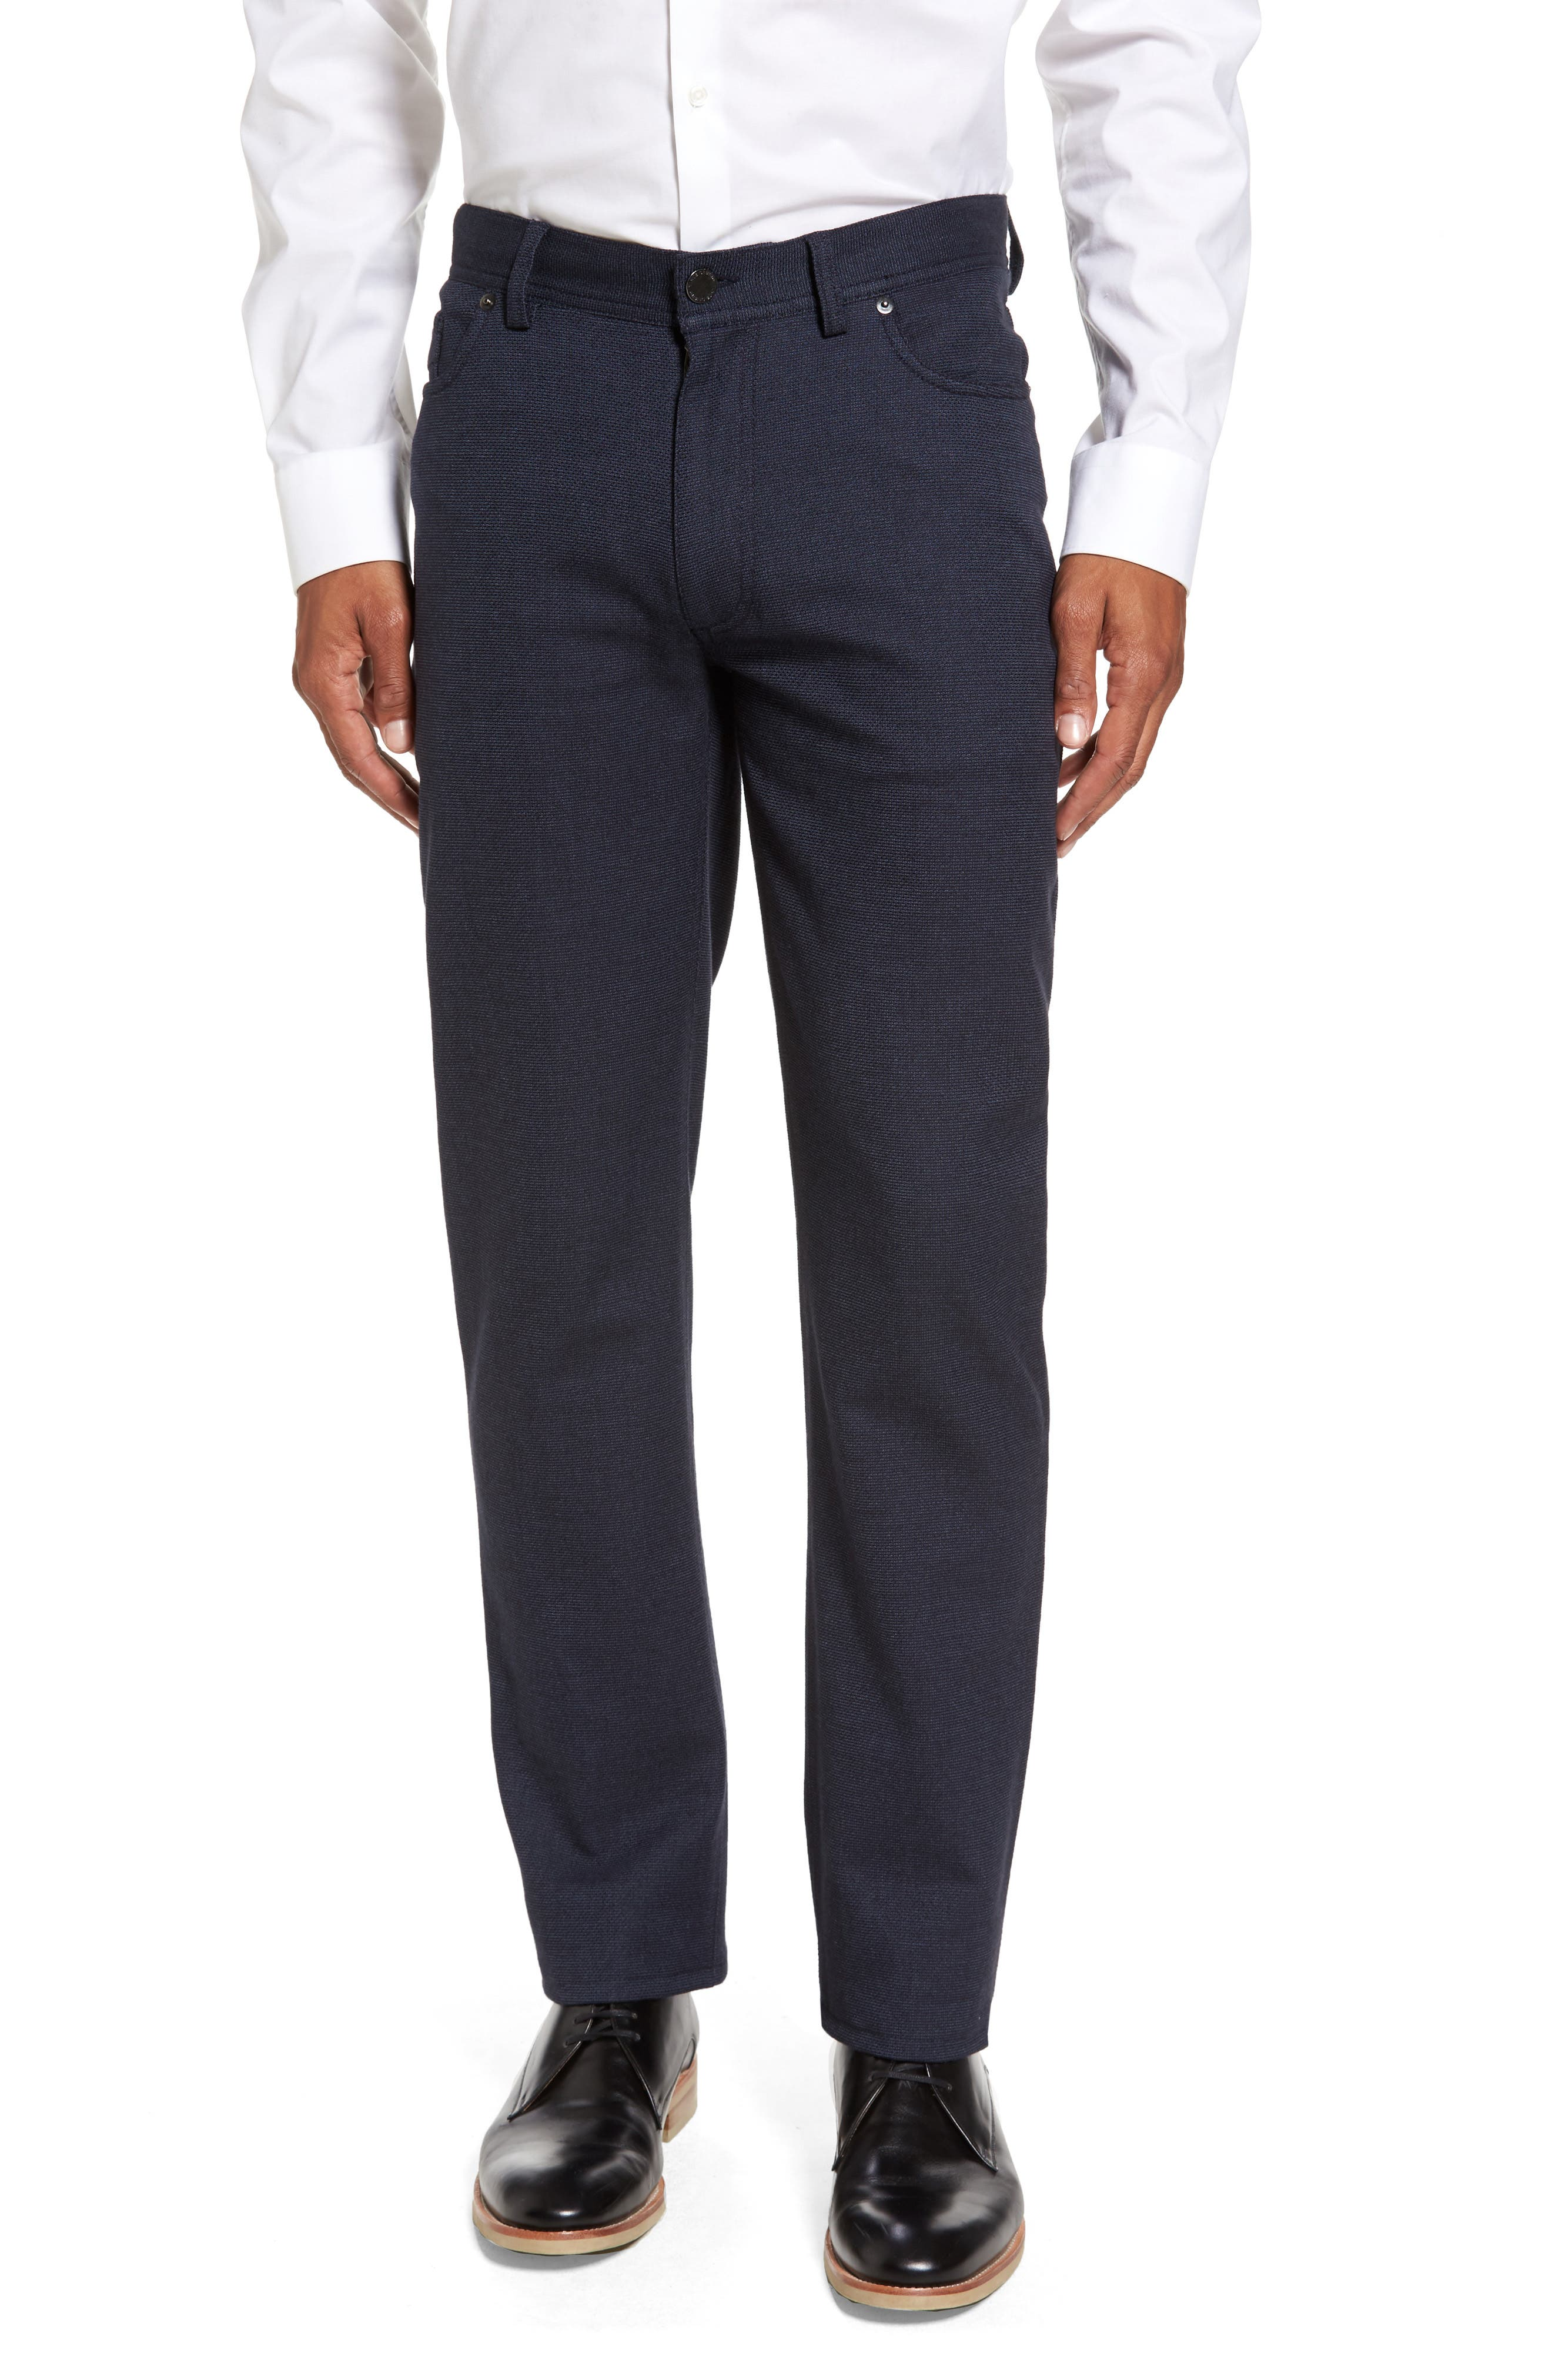 Vince Slim Fit Stretch Five-Pocket Pants,                         Main,                         color, Navy Digital Neat